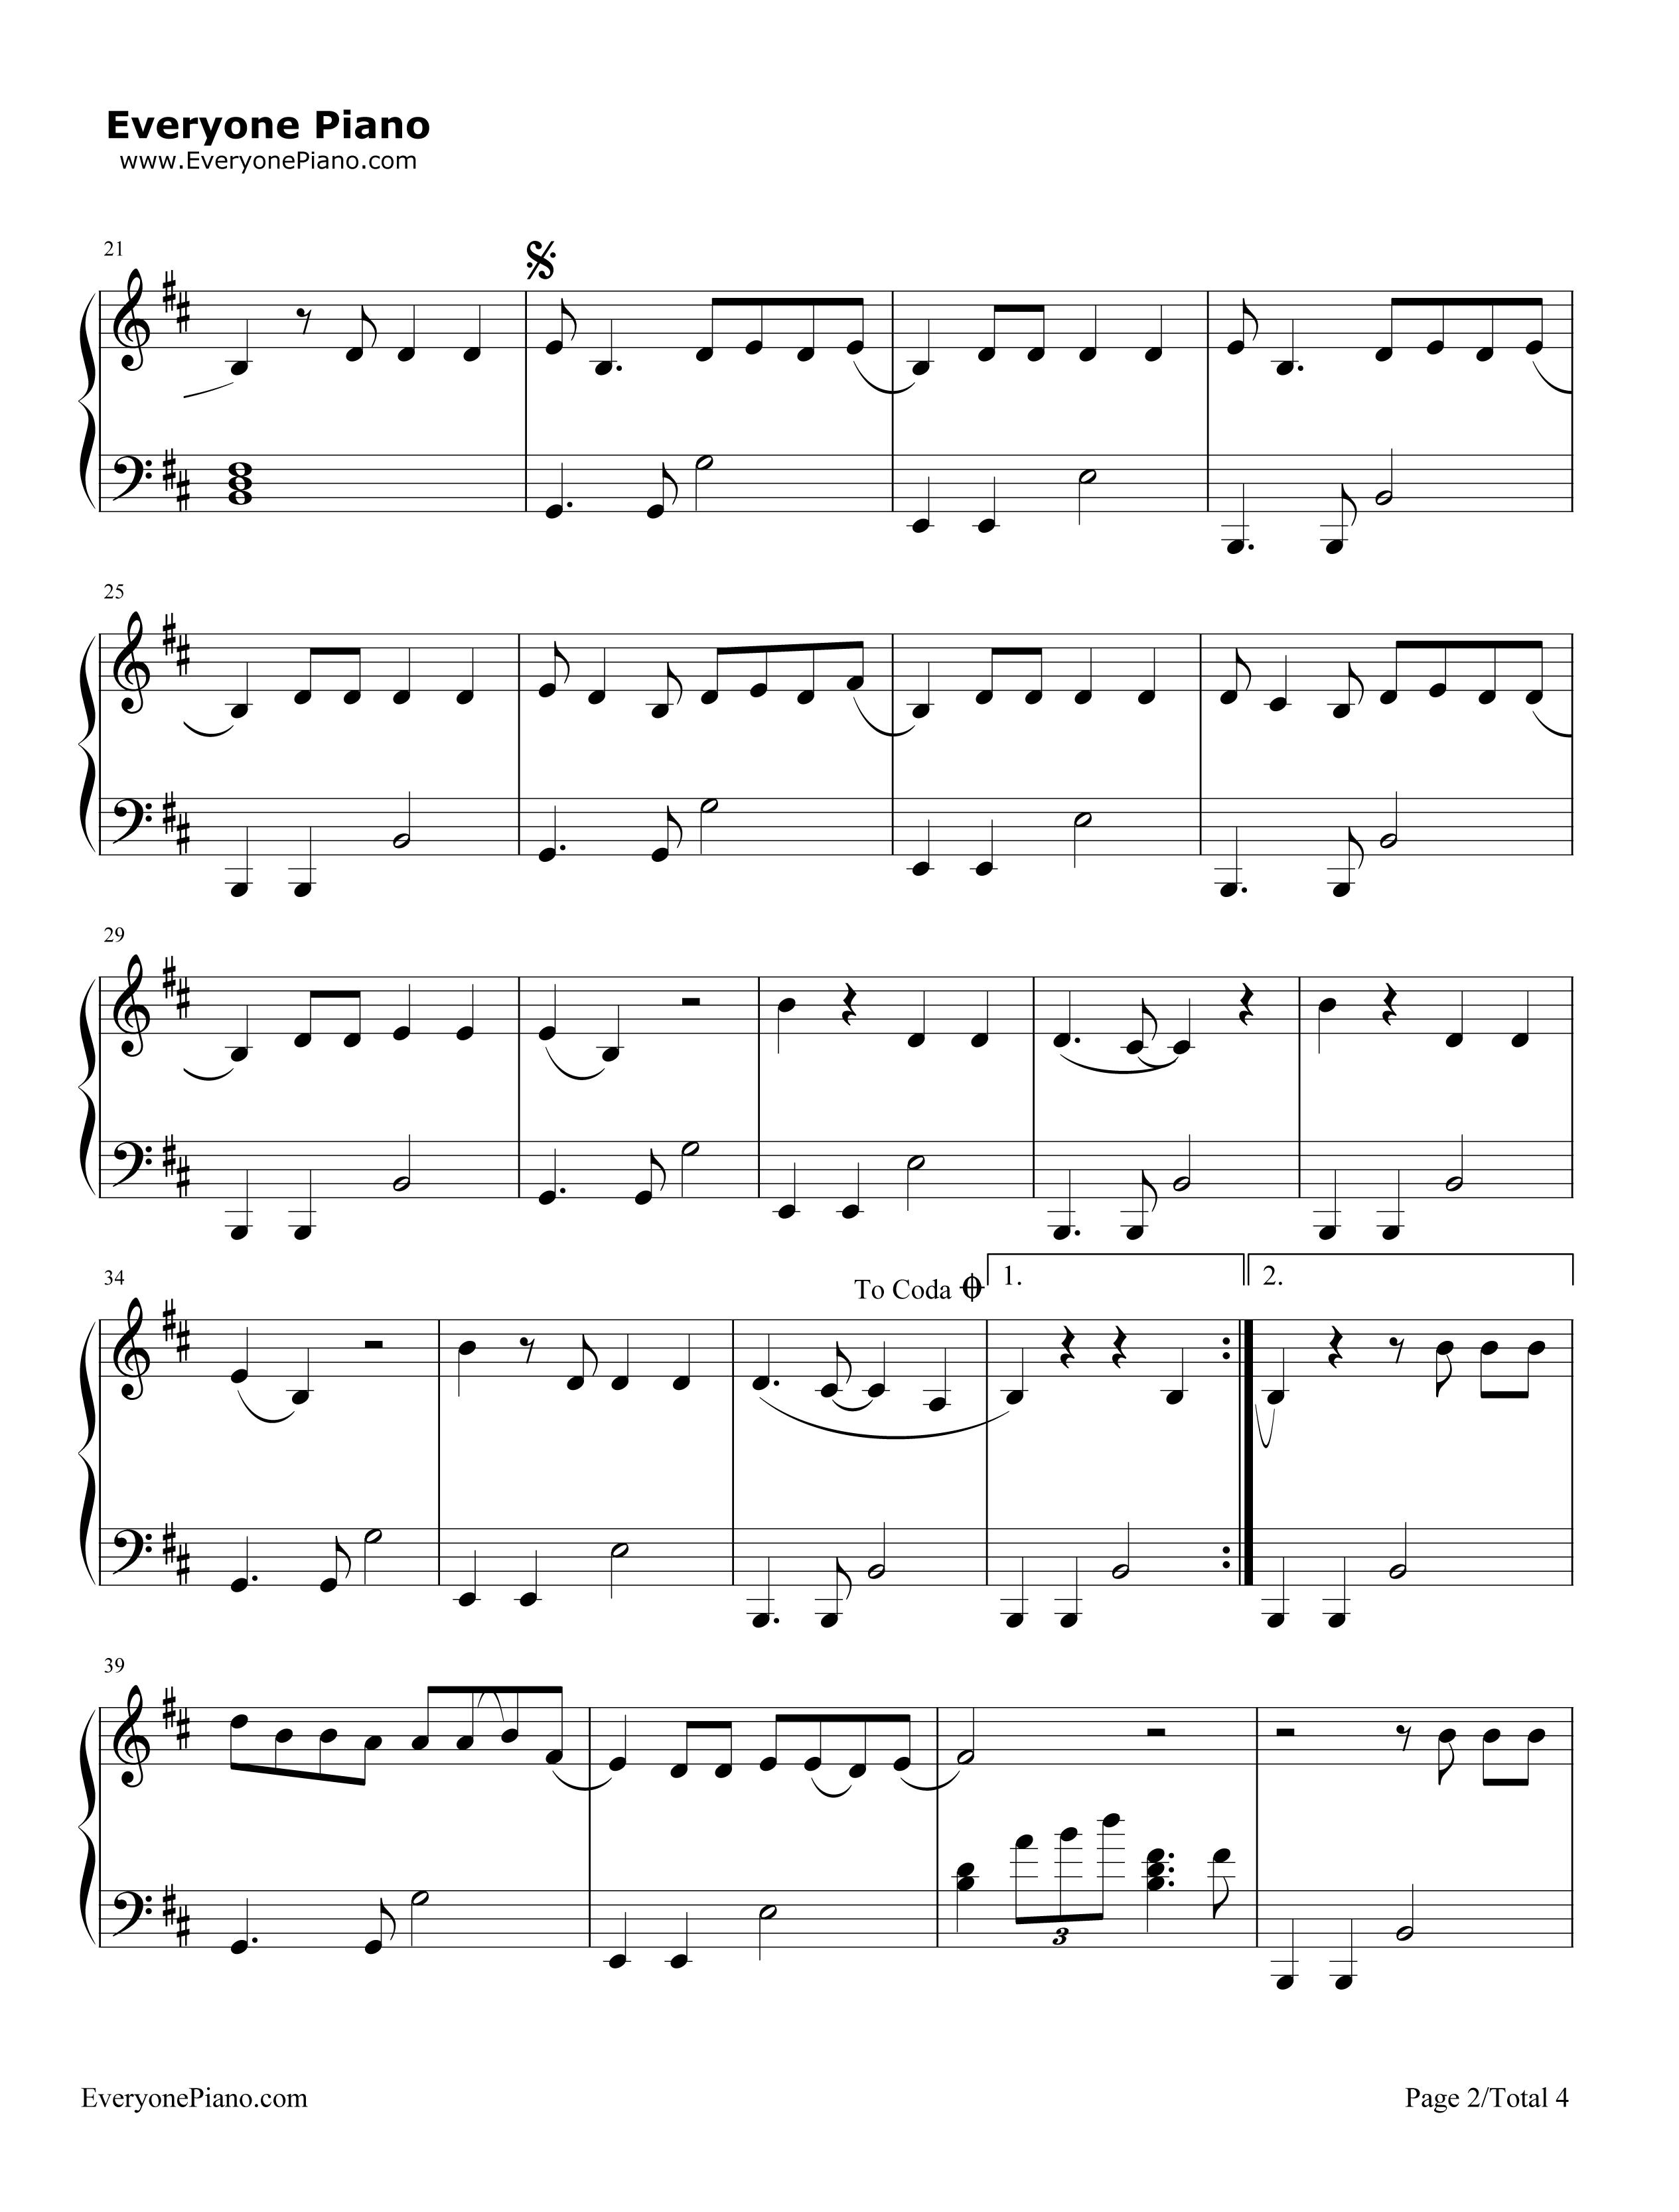 Art deco lana del rey stave preview 2 free piano sheet for Art deco lana del rey